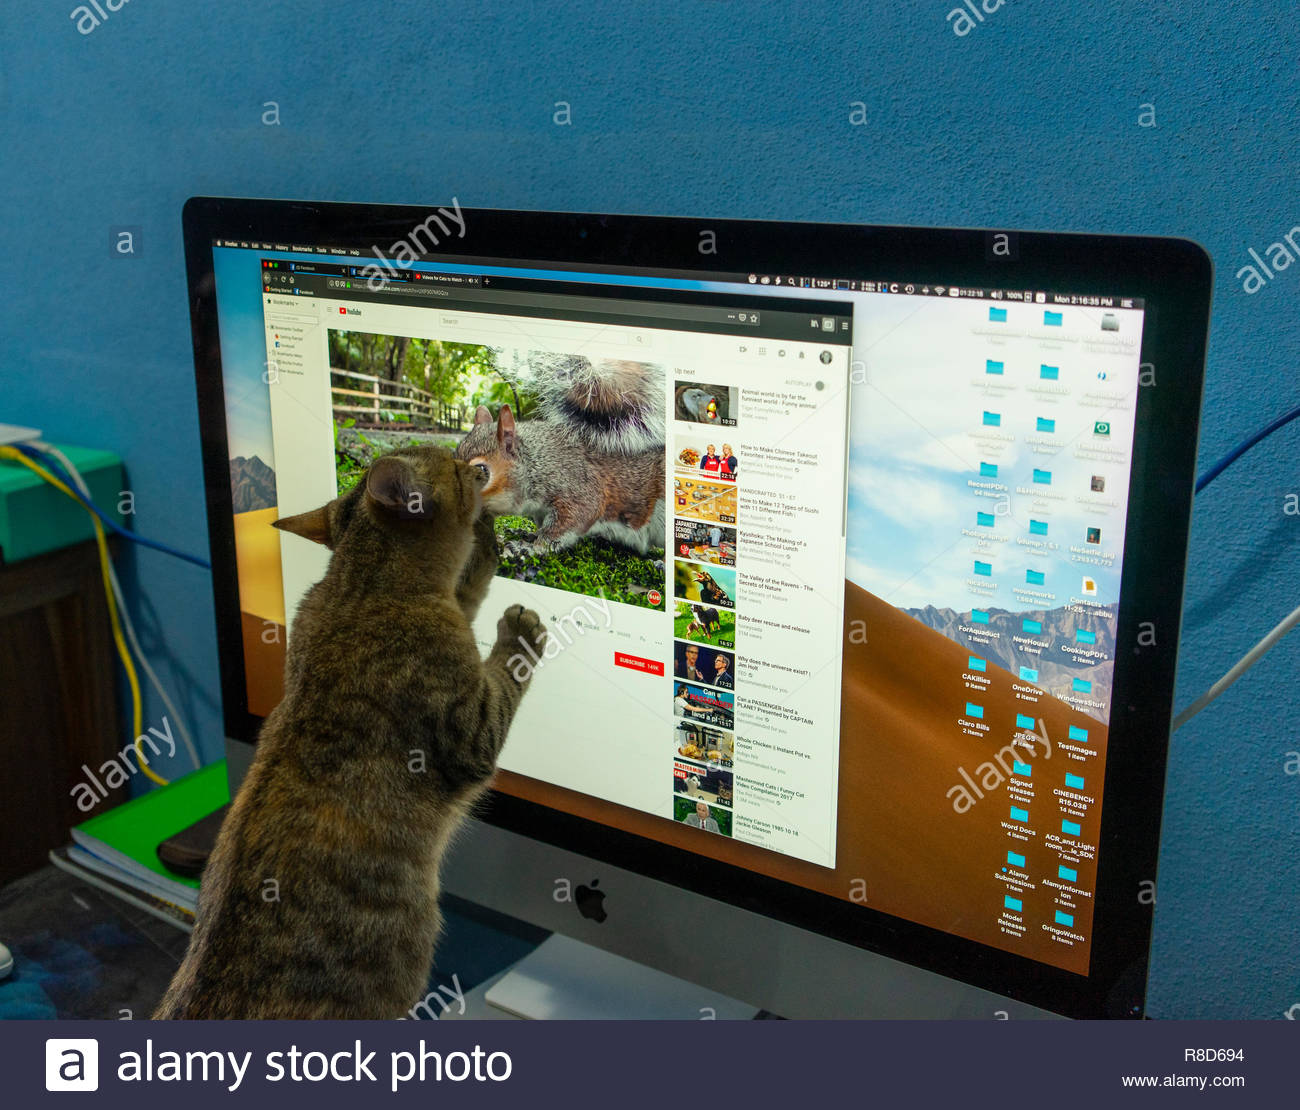 cat-attacks-a-youtube-squirrel-in-a-vide